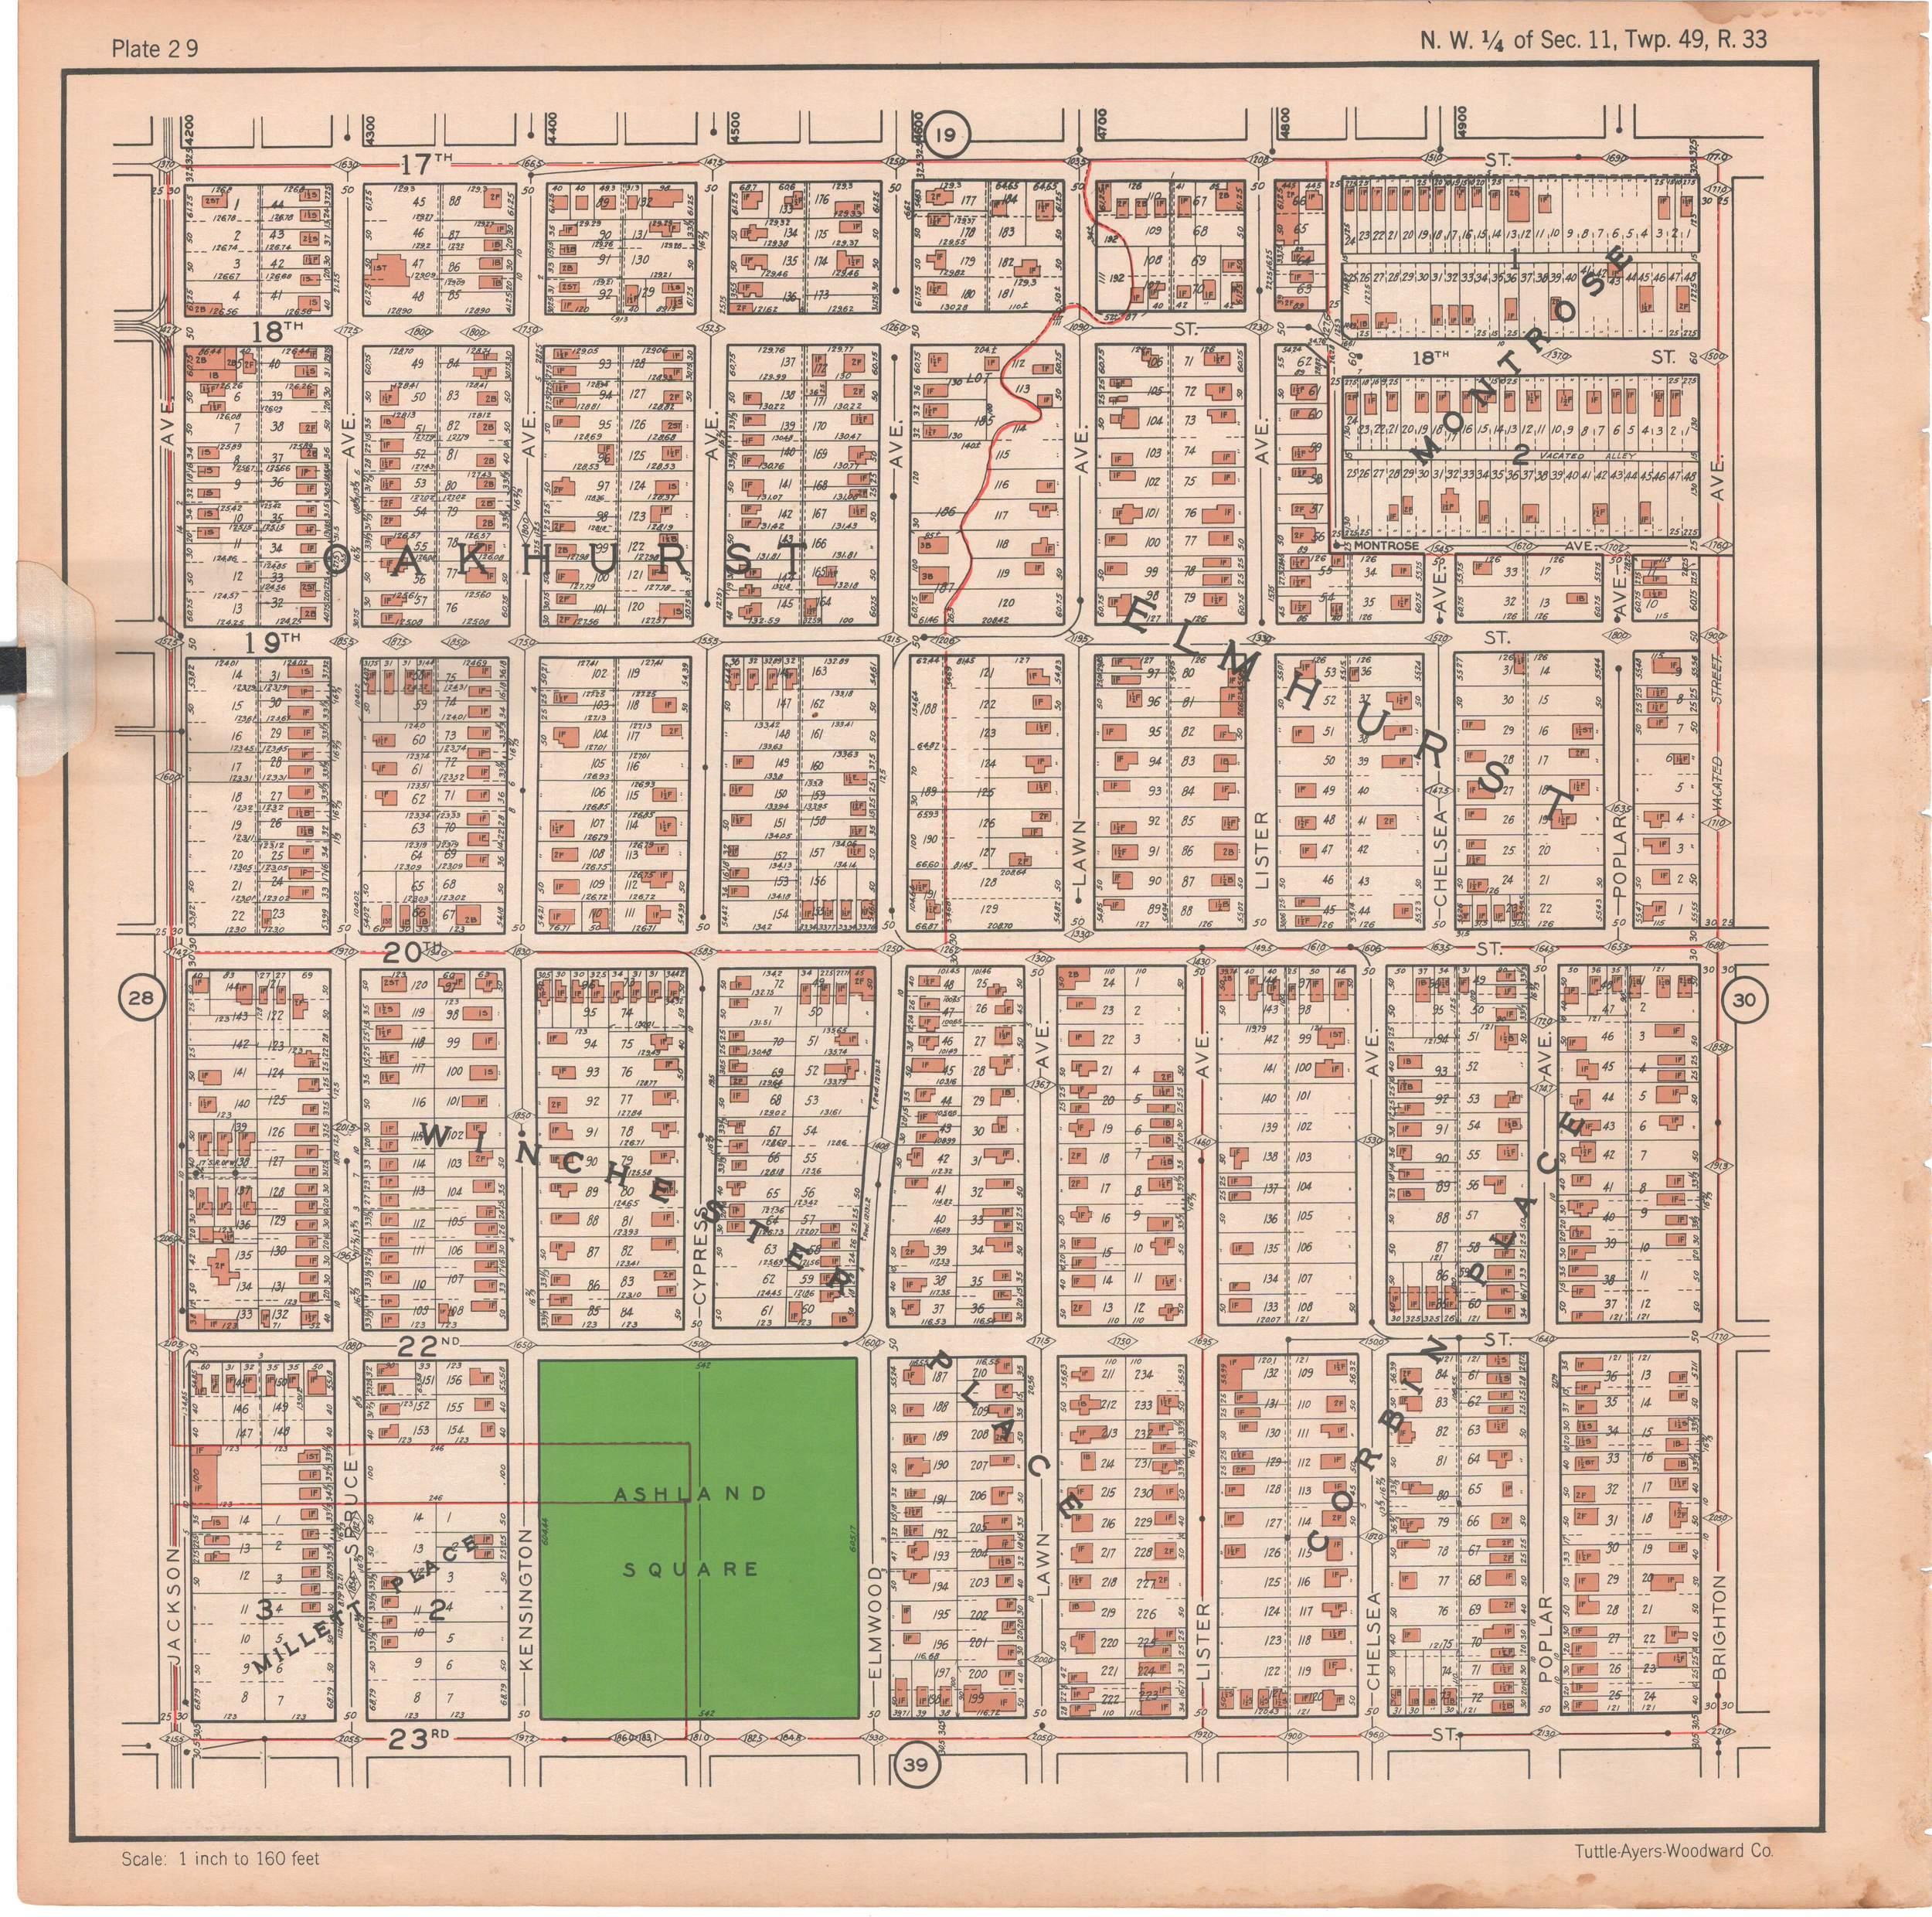 1925 TUTTLE_AYERS_Plate 29.JPG